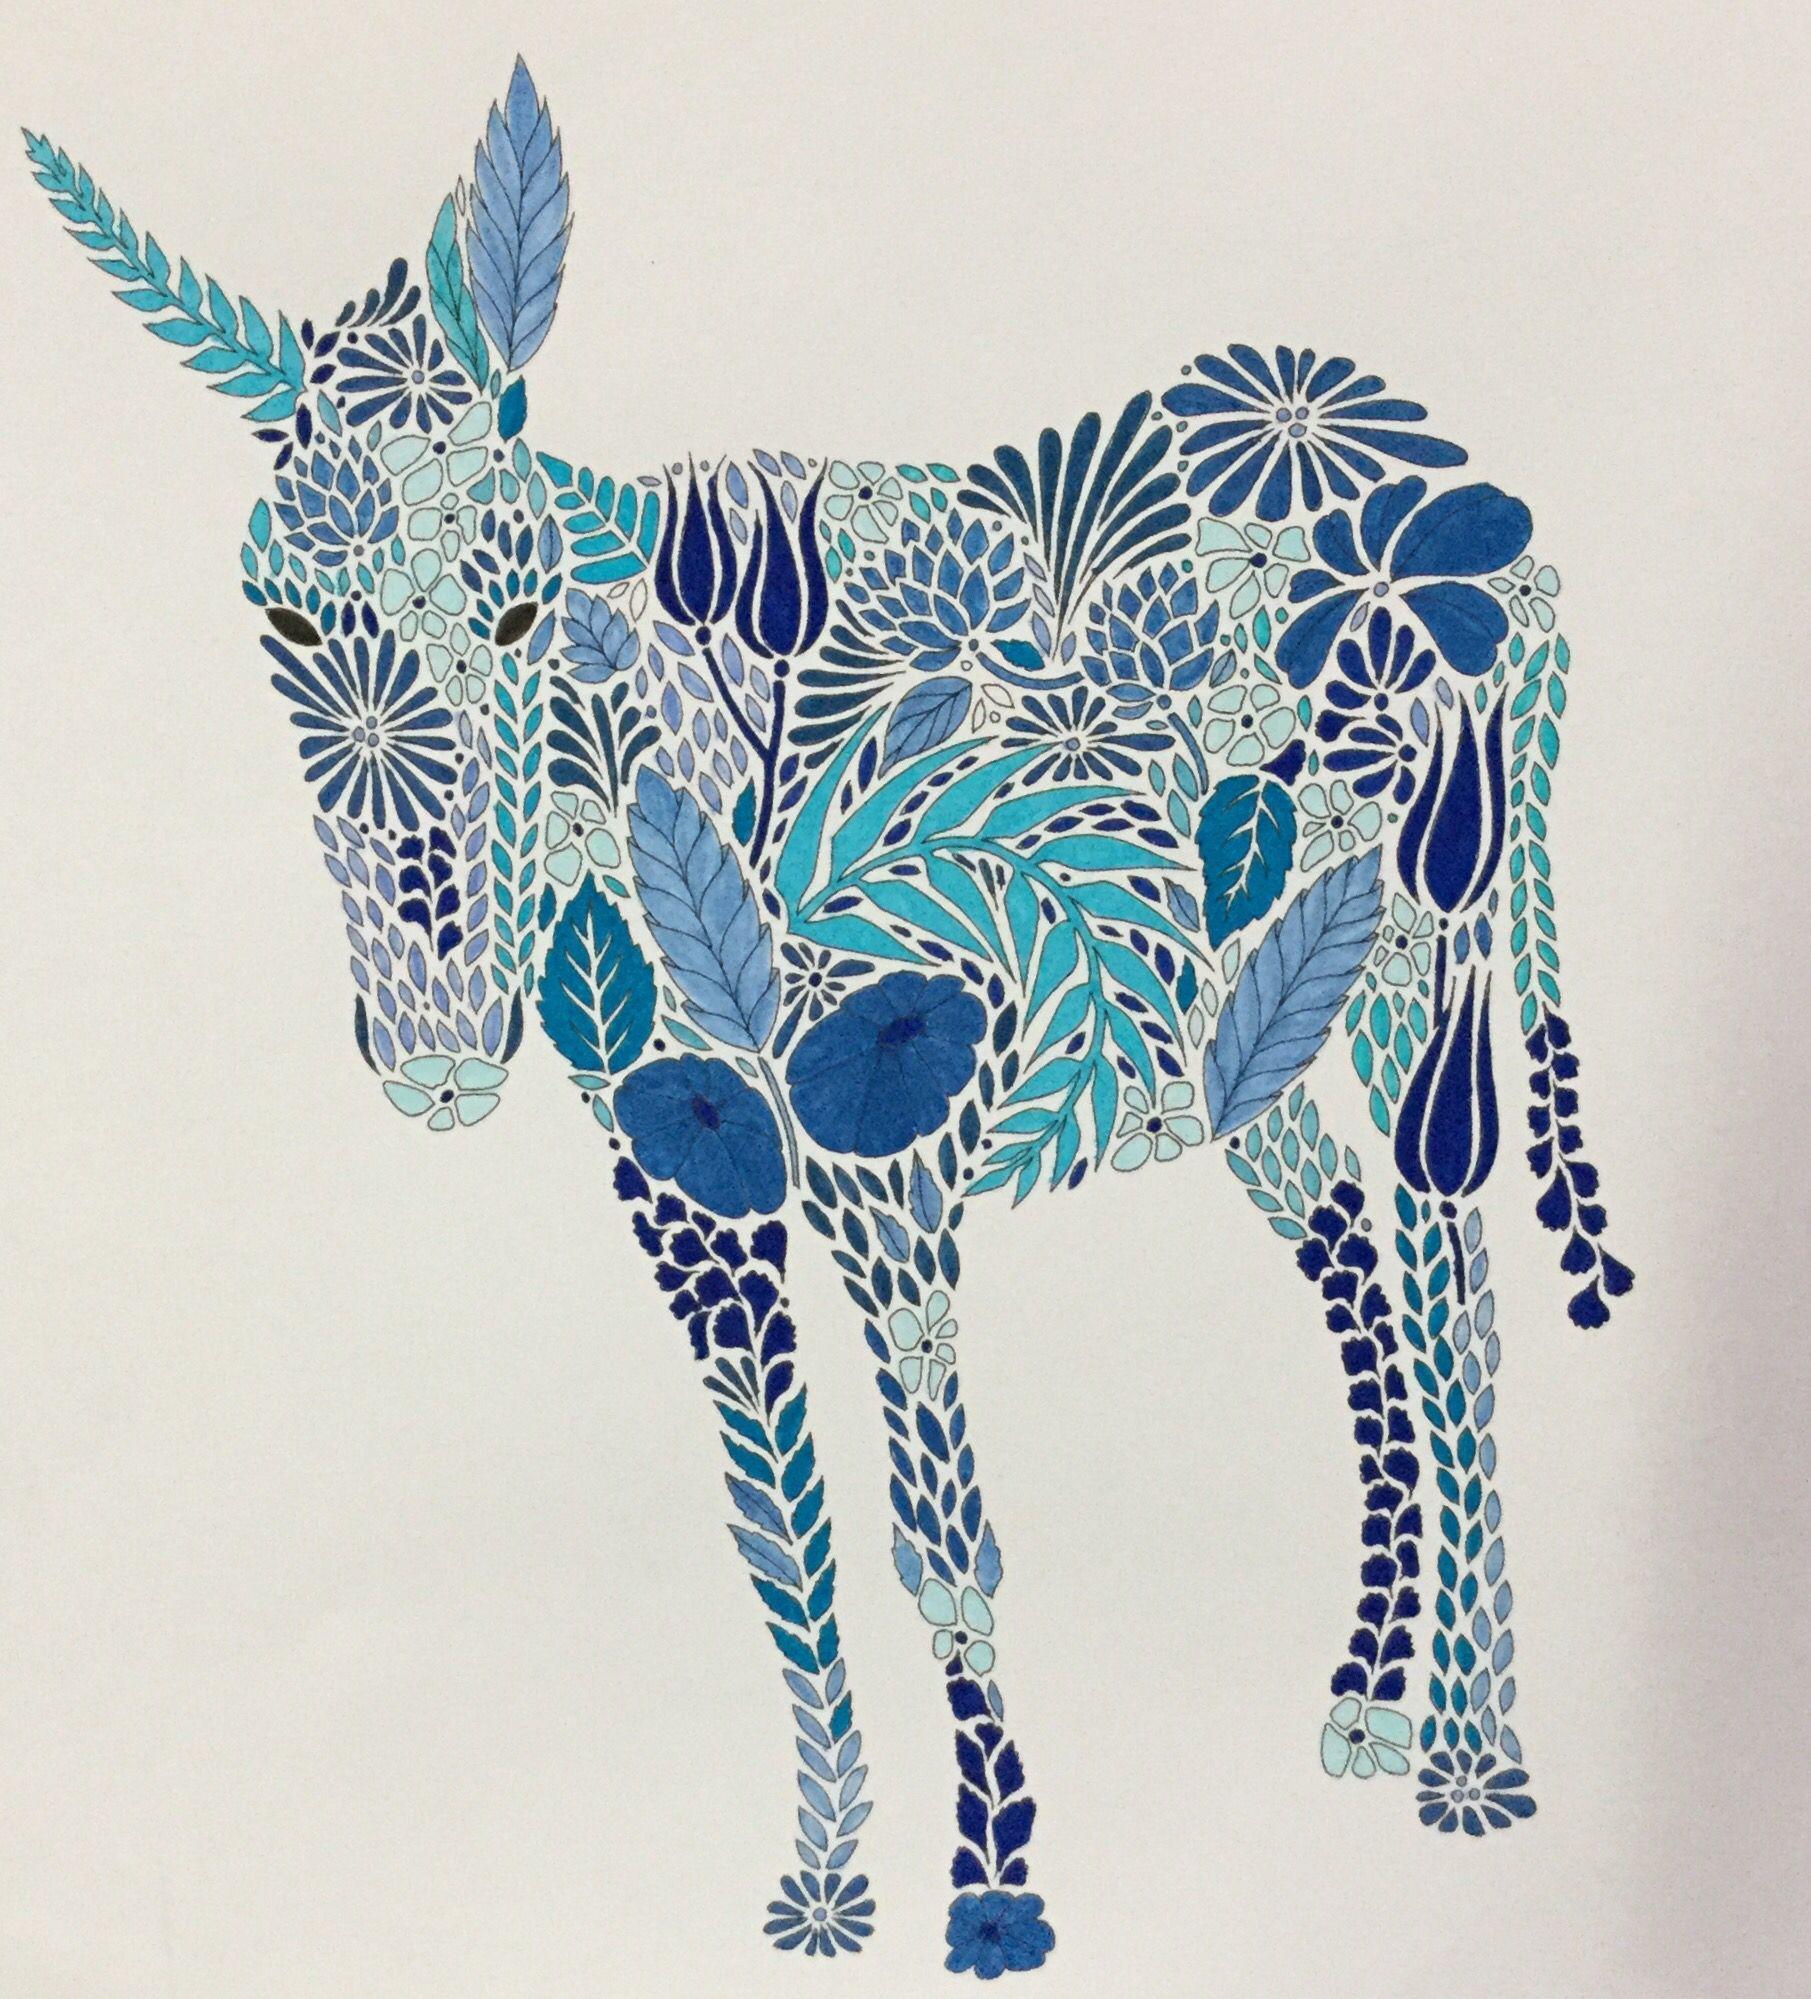 Colouring Millie Marotta Donkey Ane